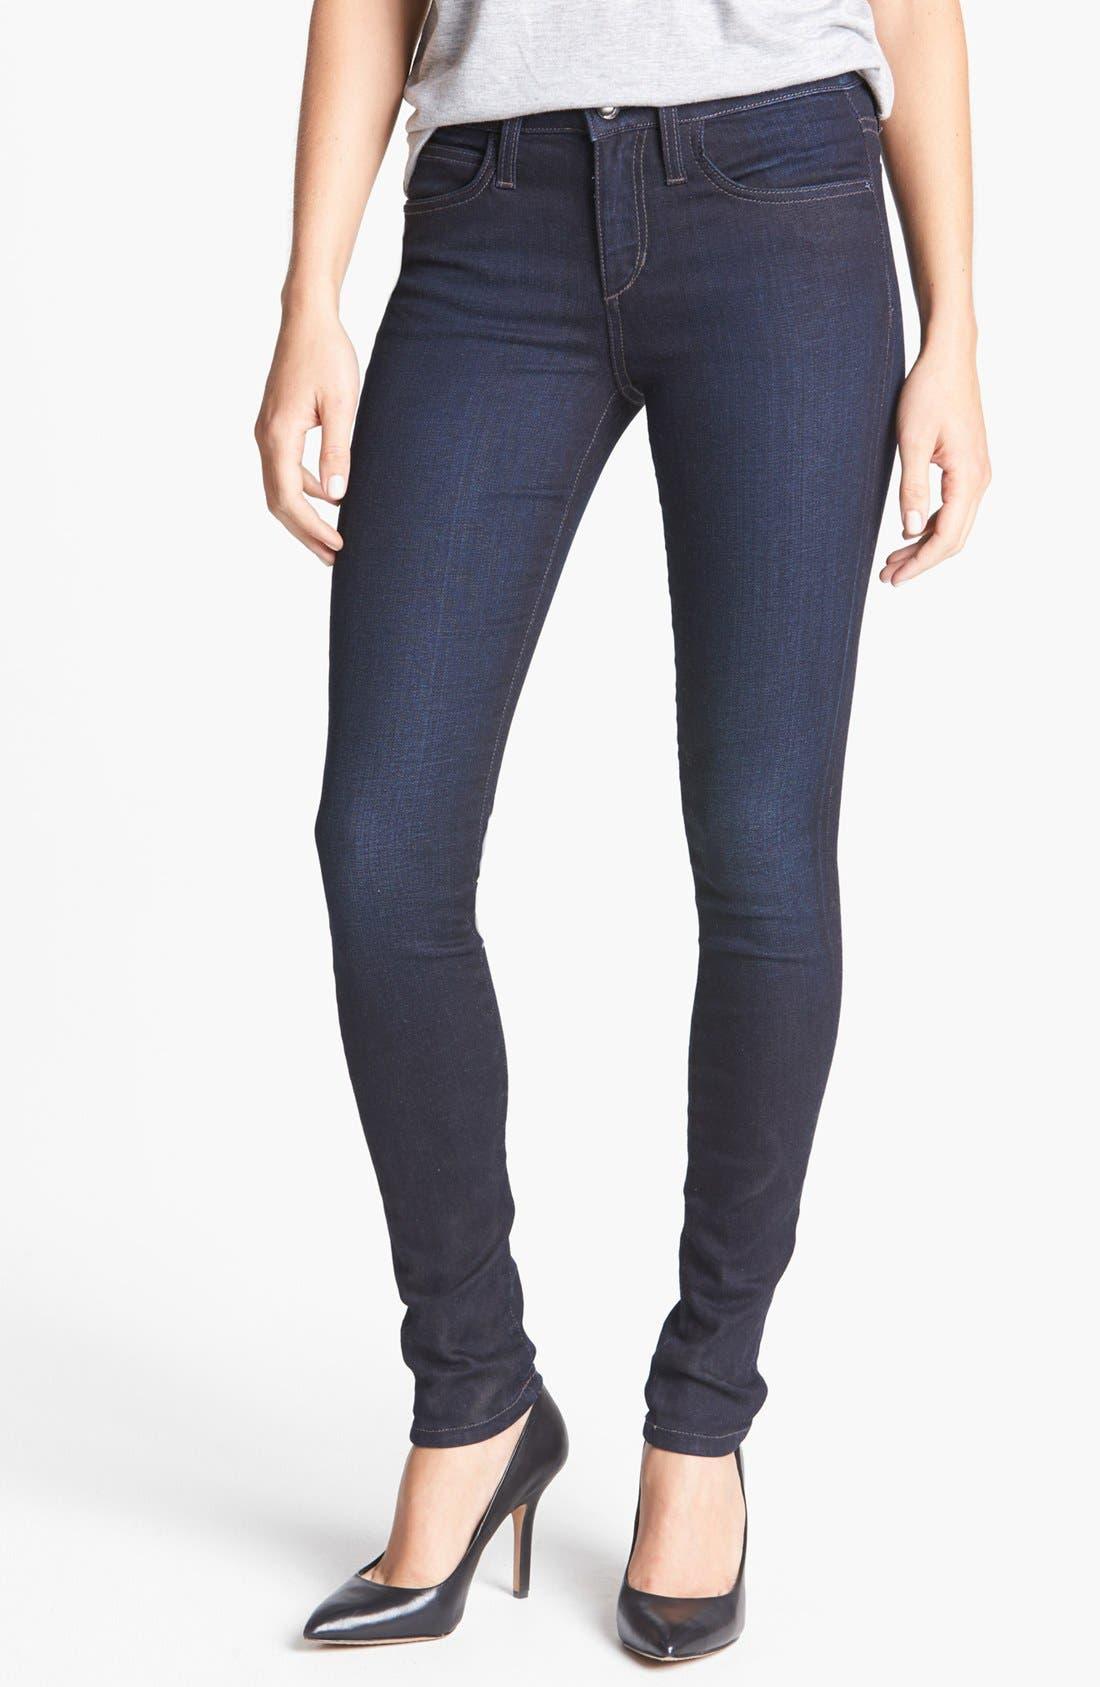 Main Image - Joe's 'The Skinny' Stretch Skinny Jeans (Auria)